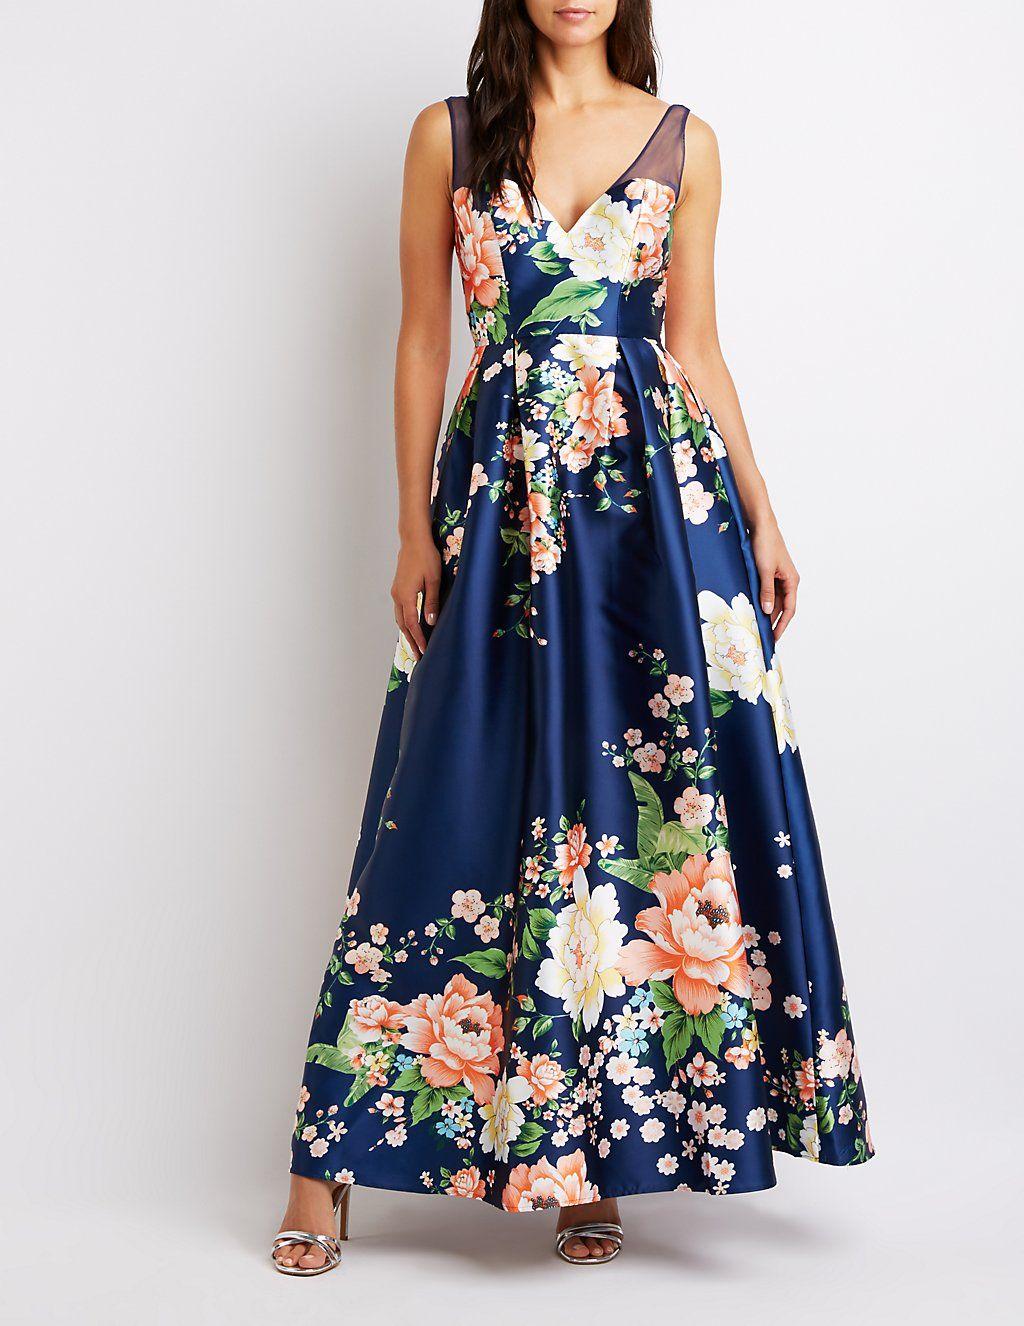 Mesh Trim Floral Maxi Dress Charlotte Russe White Floral Maxi Dress Long Floral Skirt Floral Maxi Dress [ 1326 x 1024 Pixel ]